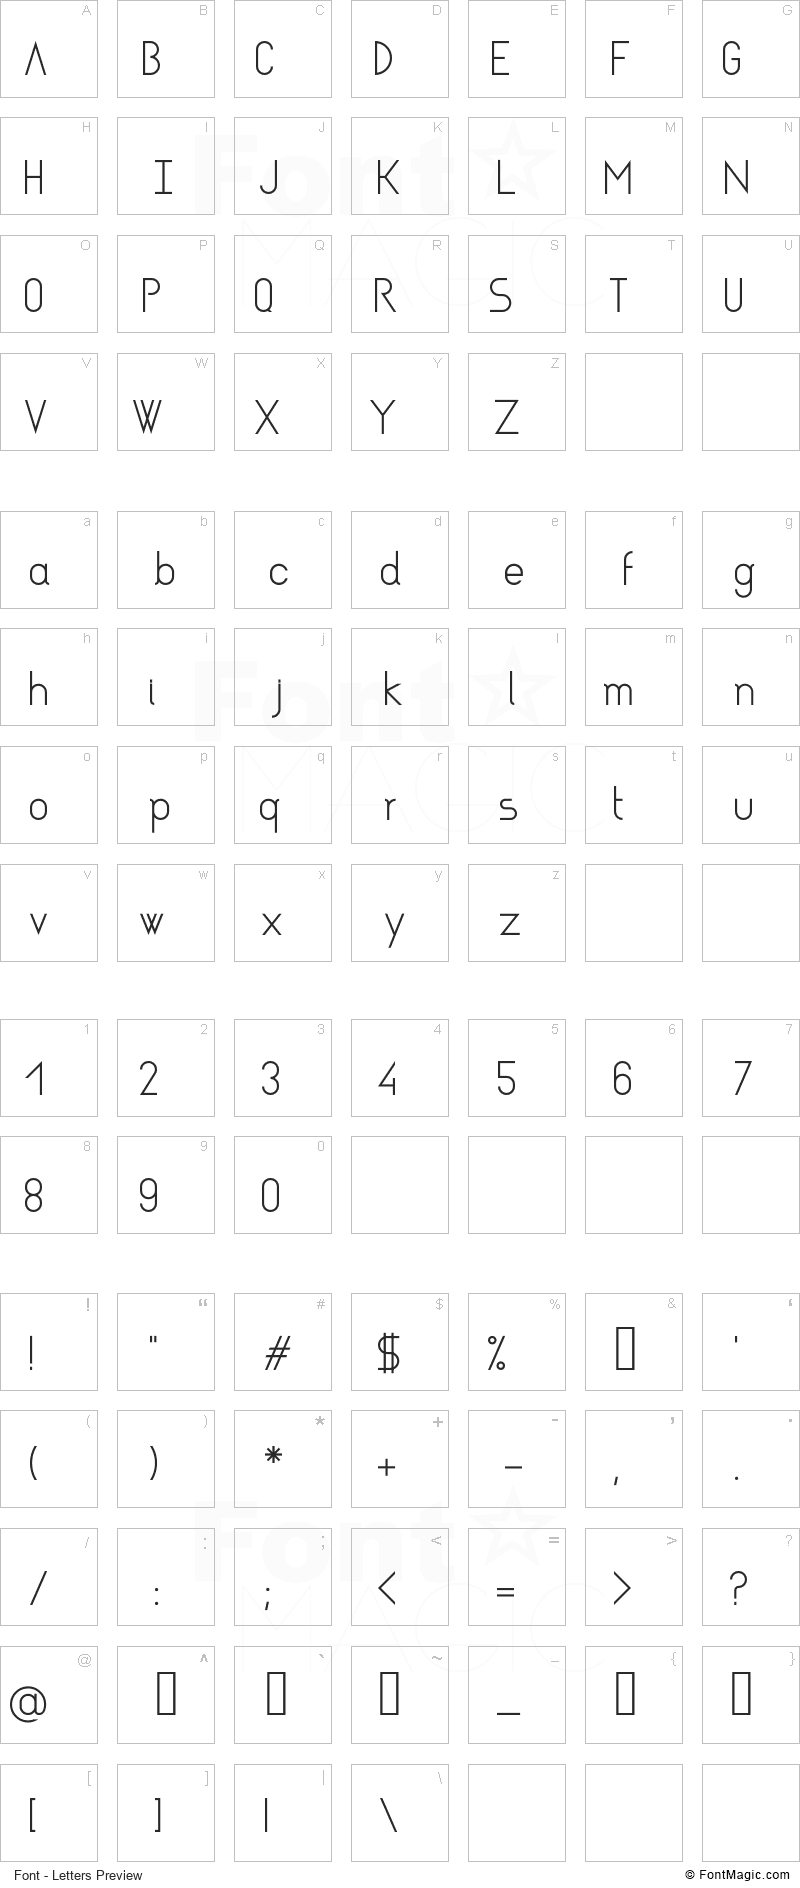 Asgalt Font - All Latters Preview Chart